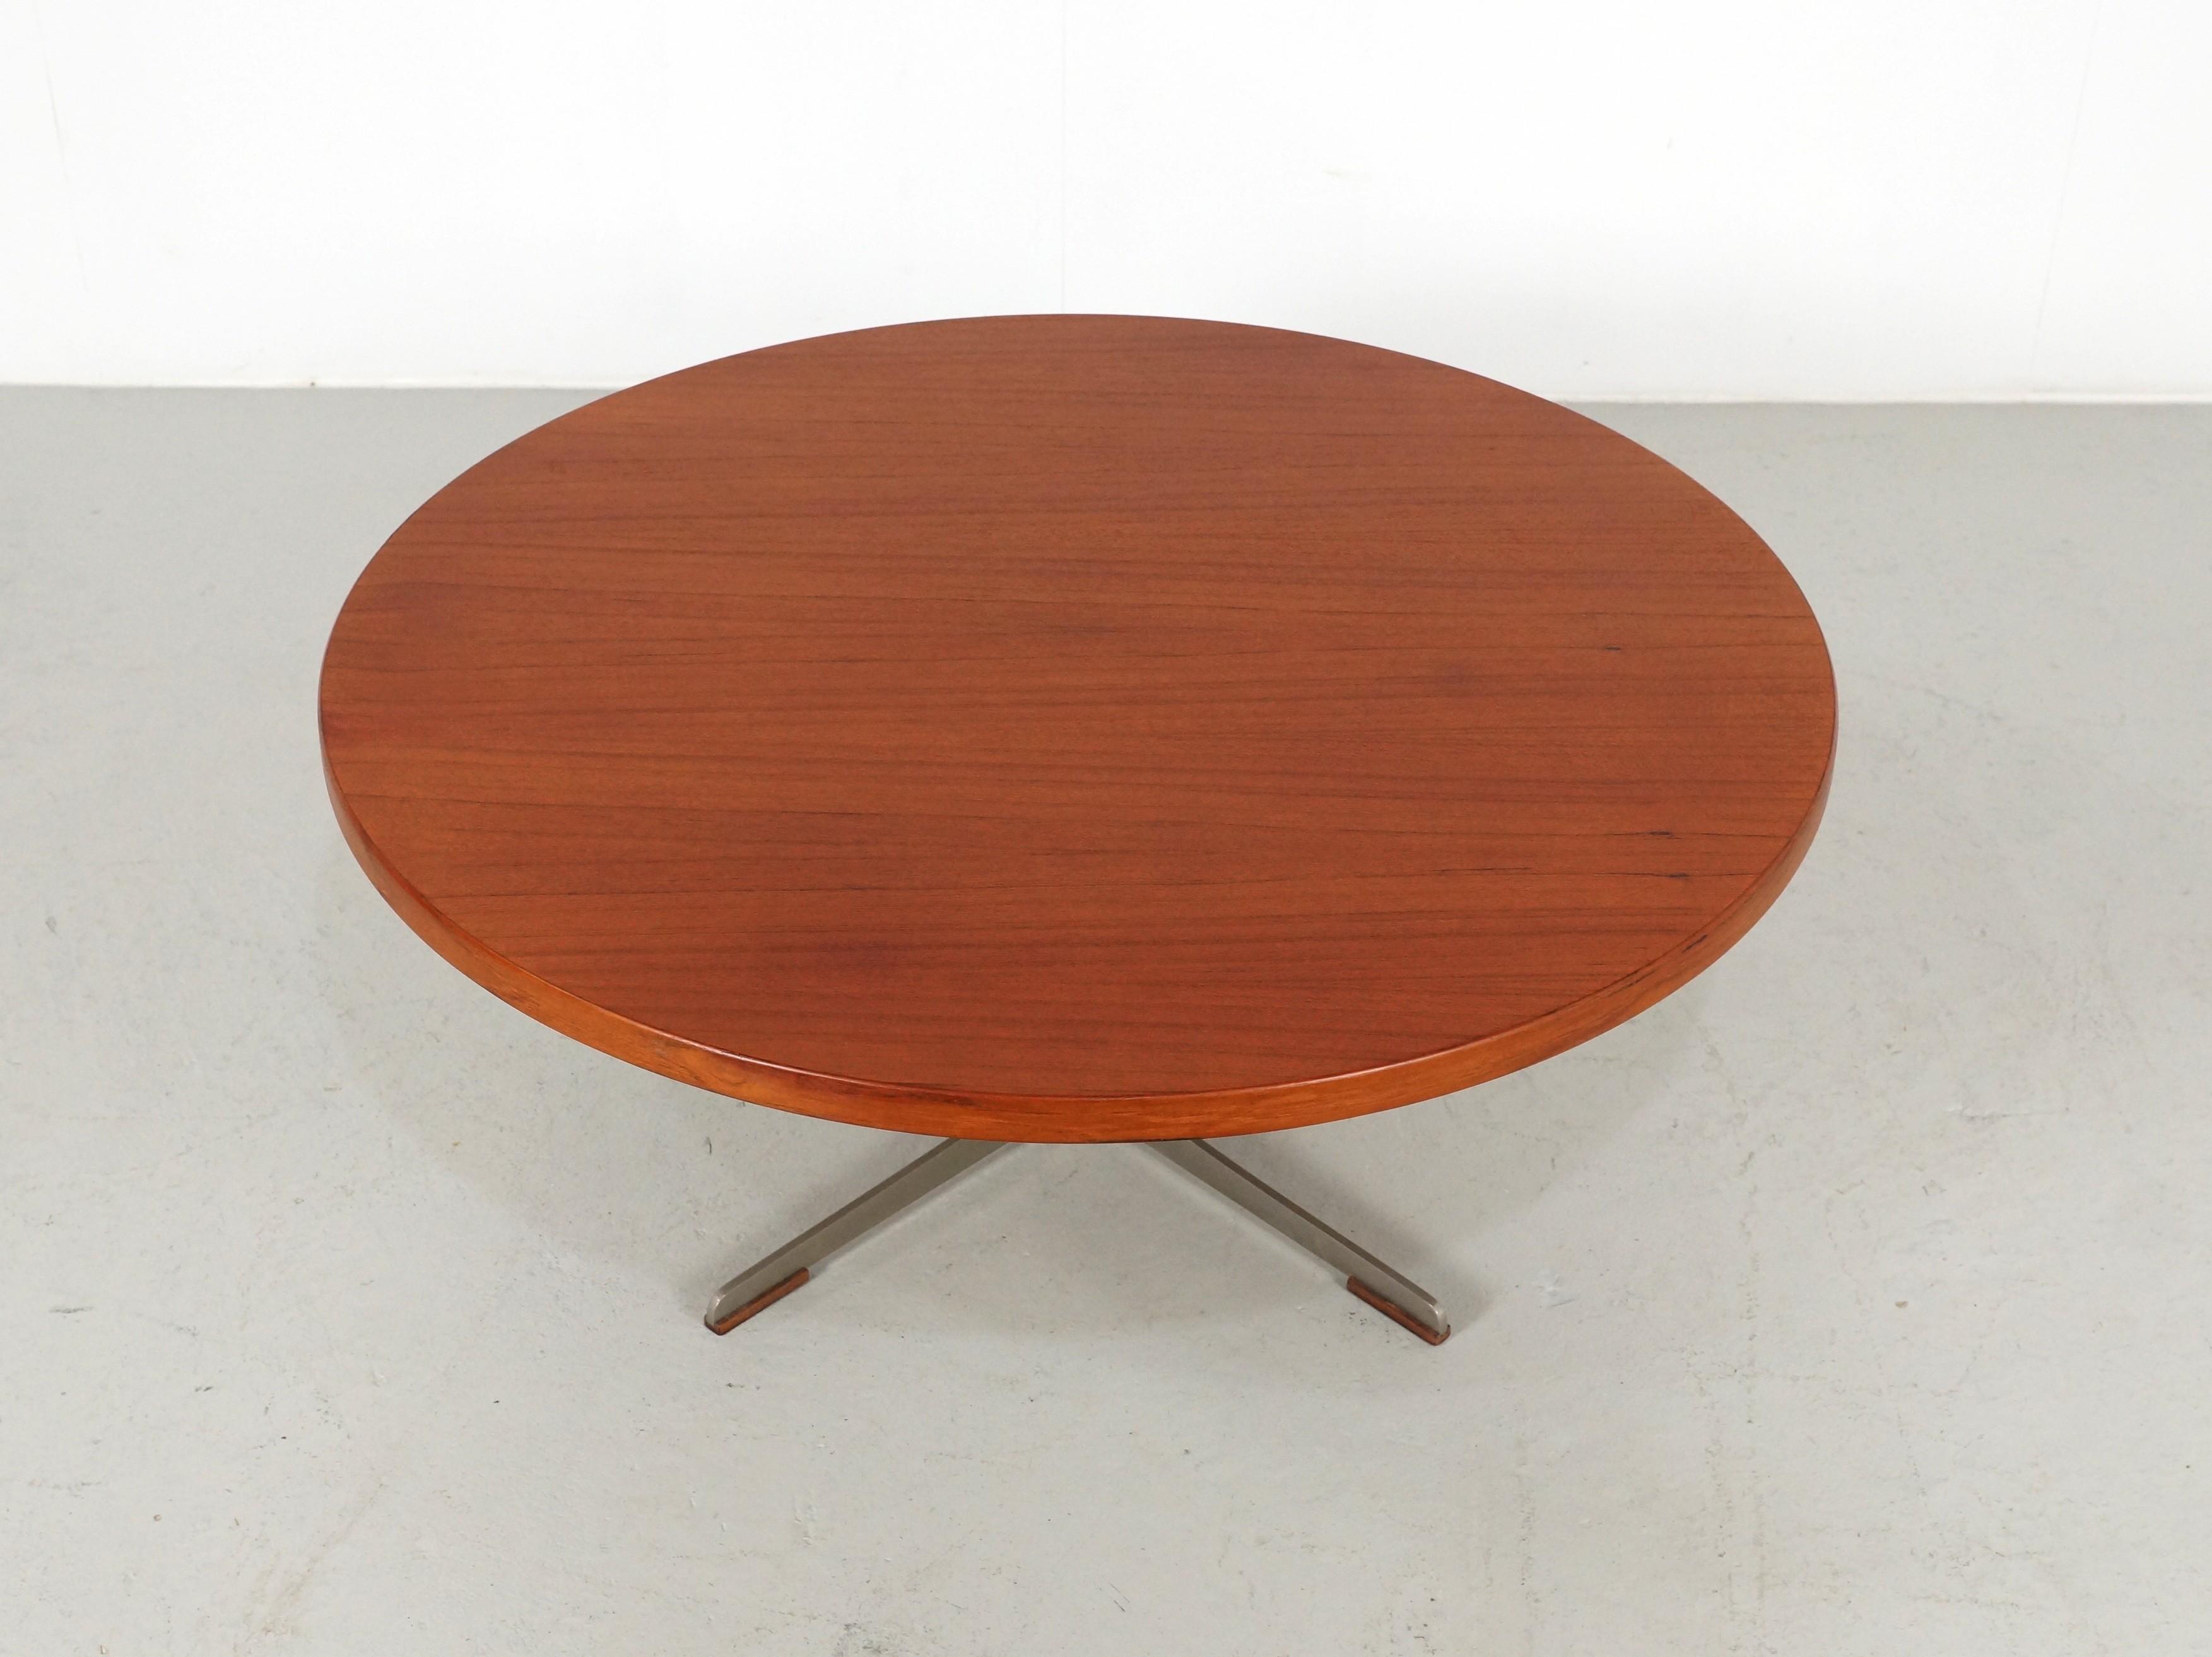 100 Vintage Round Coffee Table Amazon Roundhill Furnitu Coffee